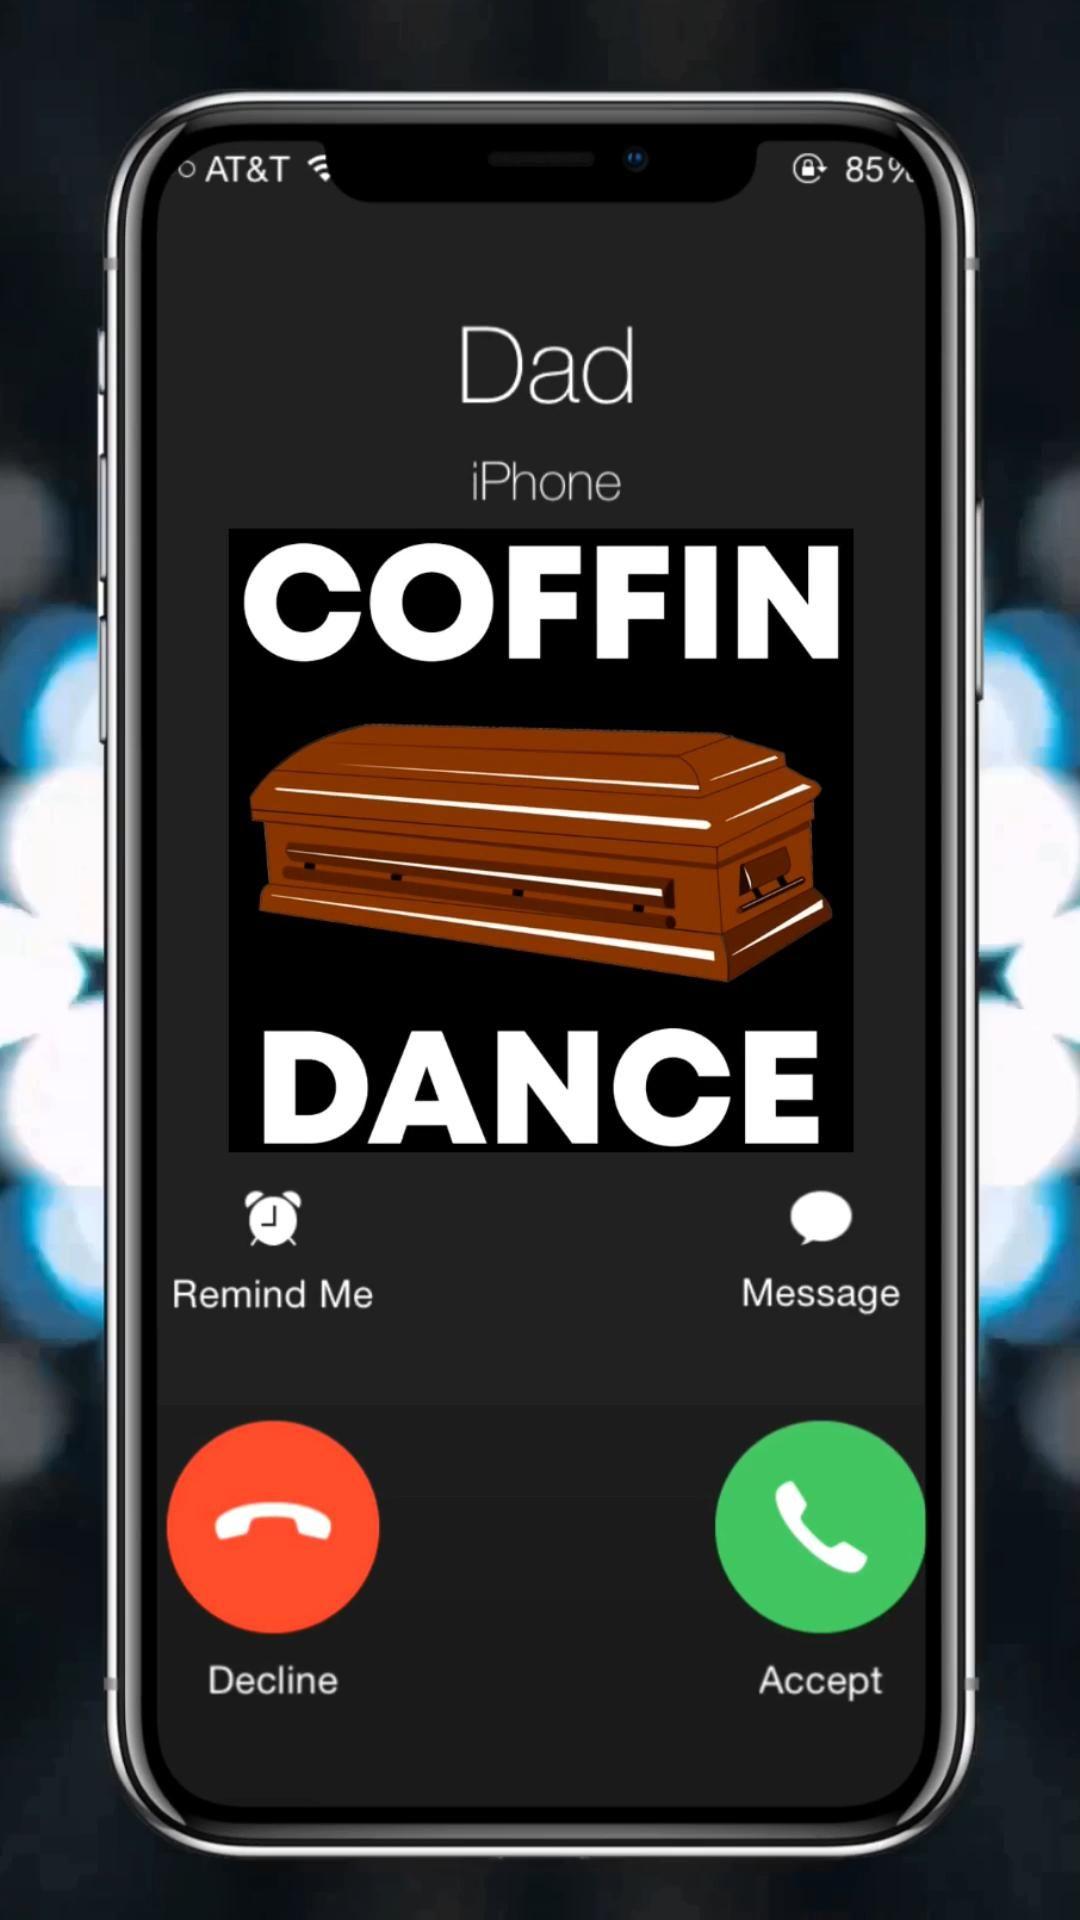 Coffin Dance Ringtone Download Astronomia Ringtone Video Ringtone Download Music Ringtones Best Ringtones